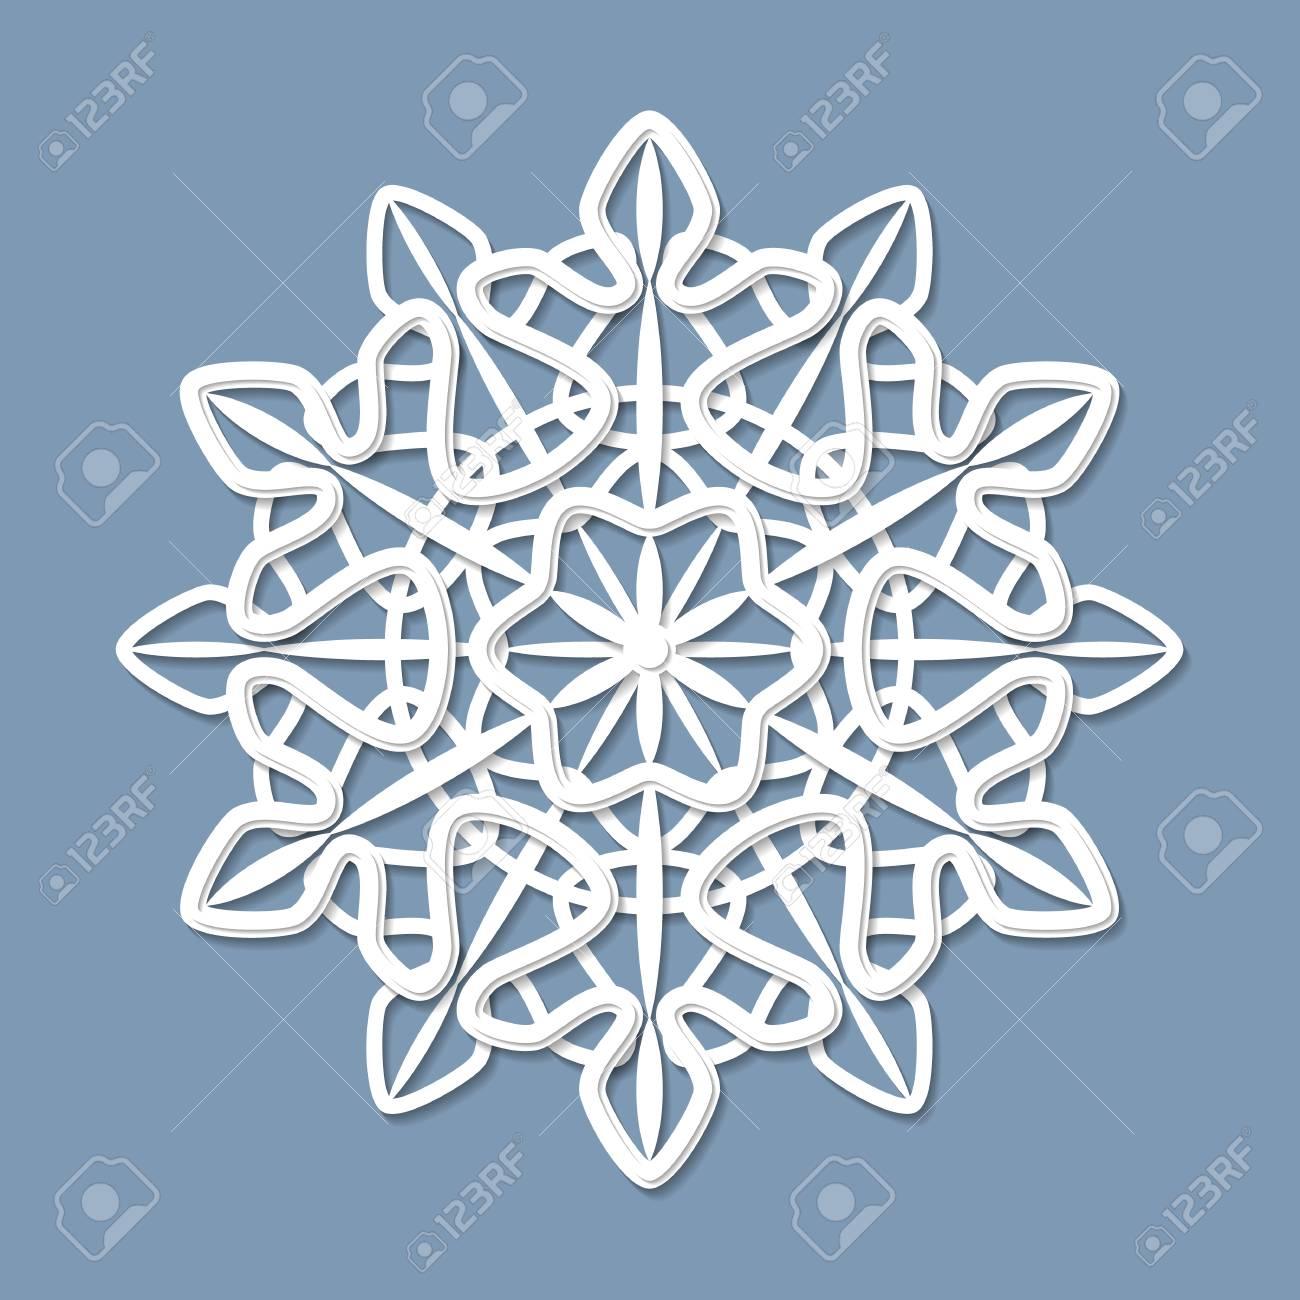 Patrón Calado Simétrico Redondo, Mandala, Copo De Nieve De Encaje ...